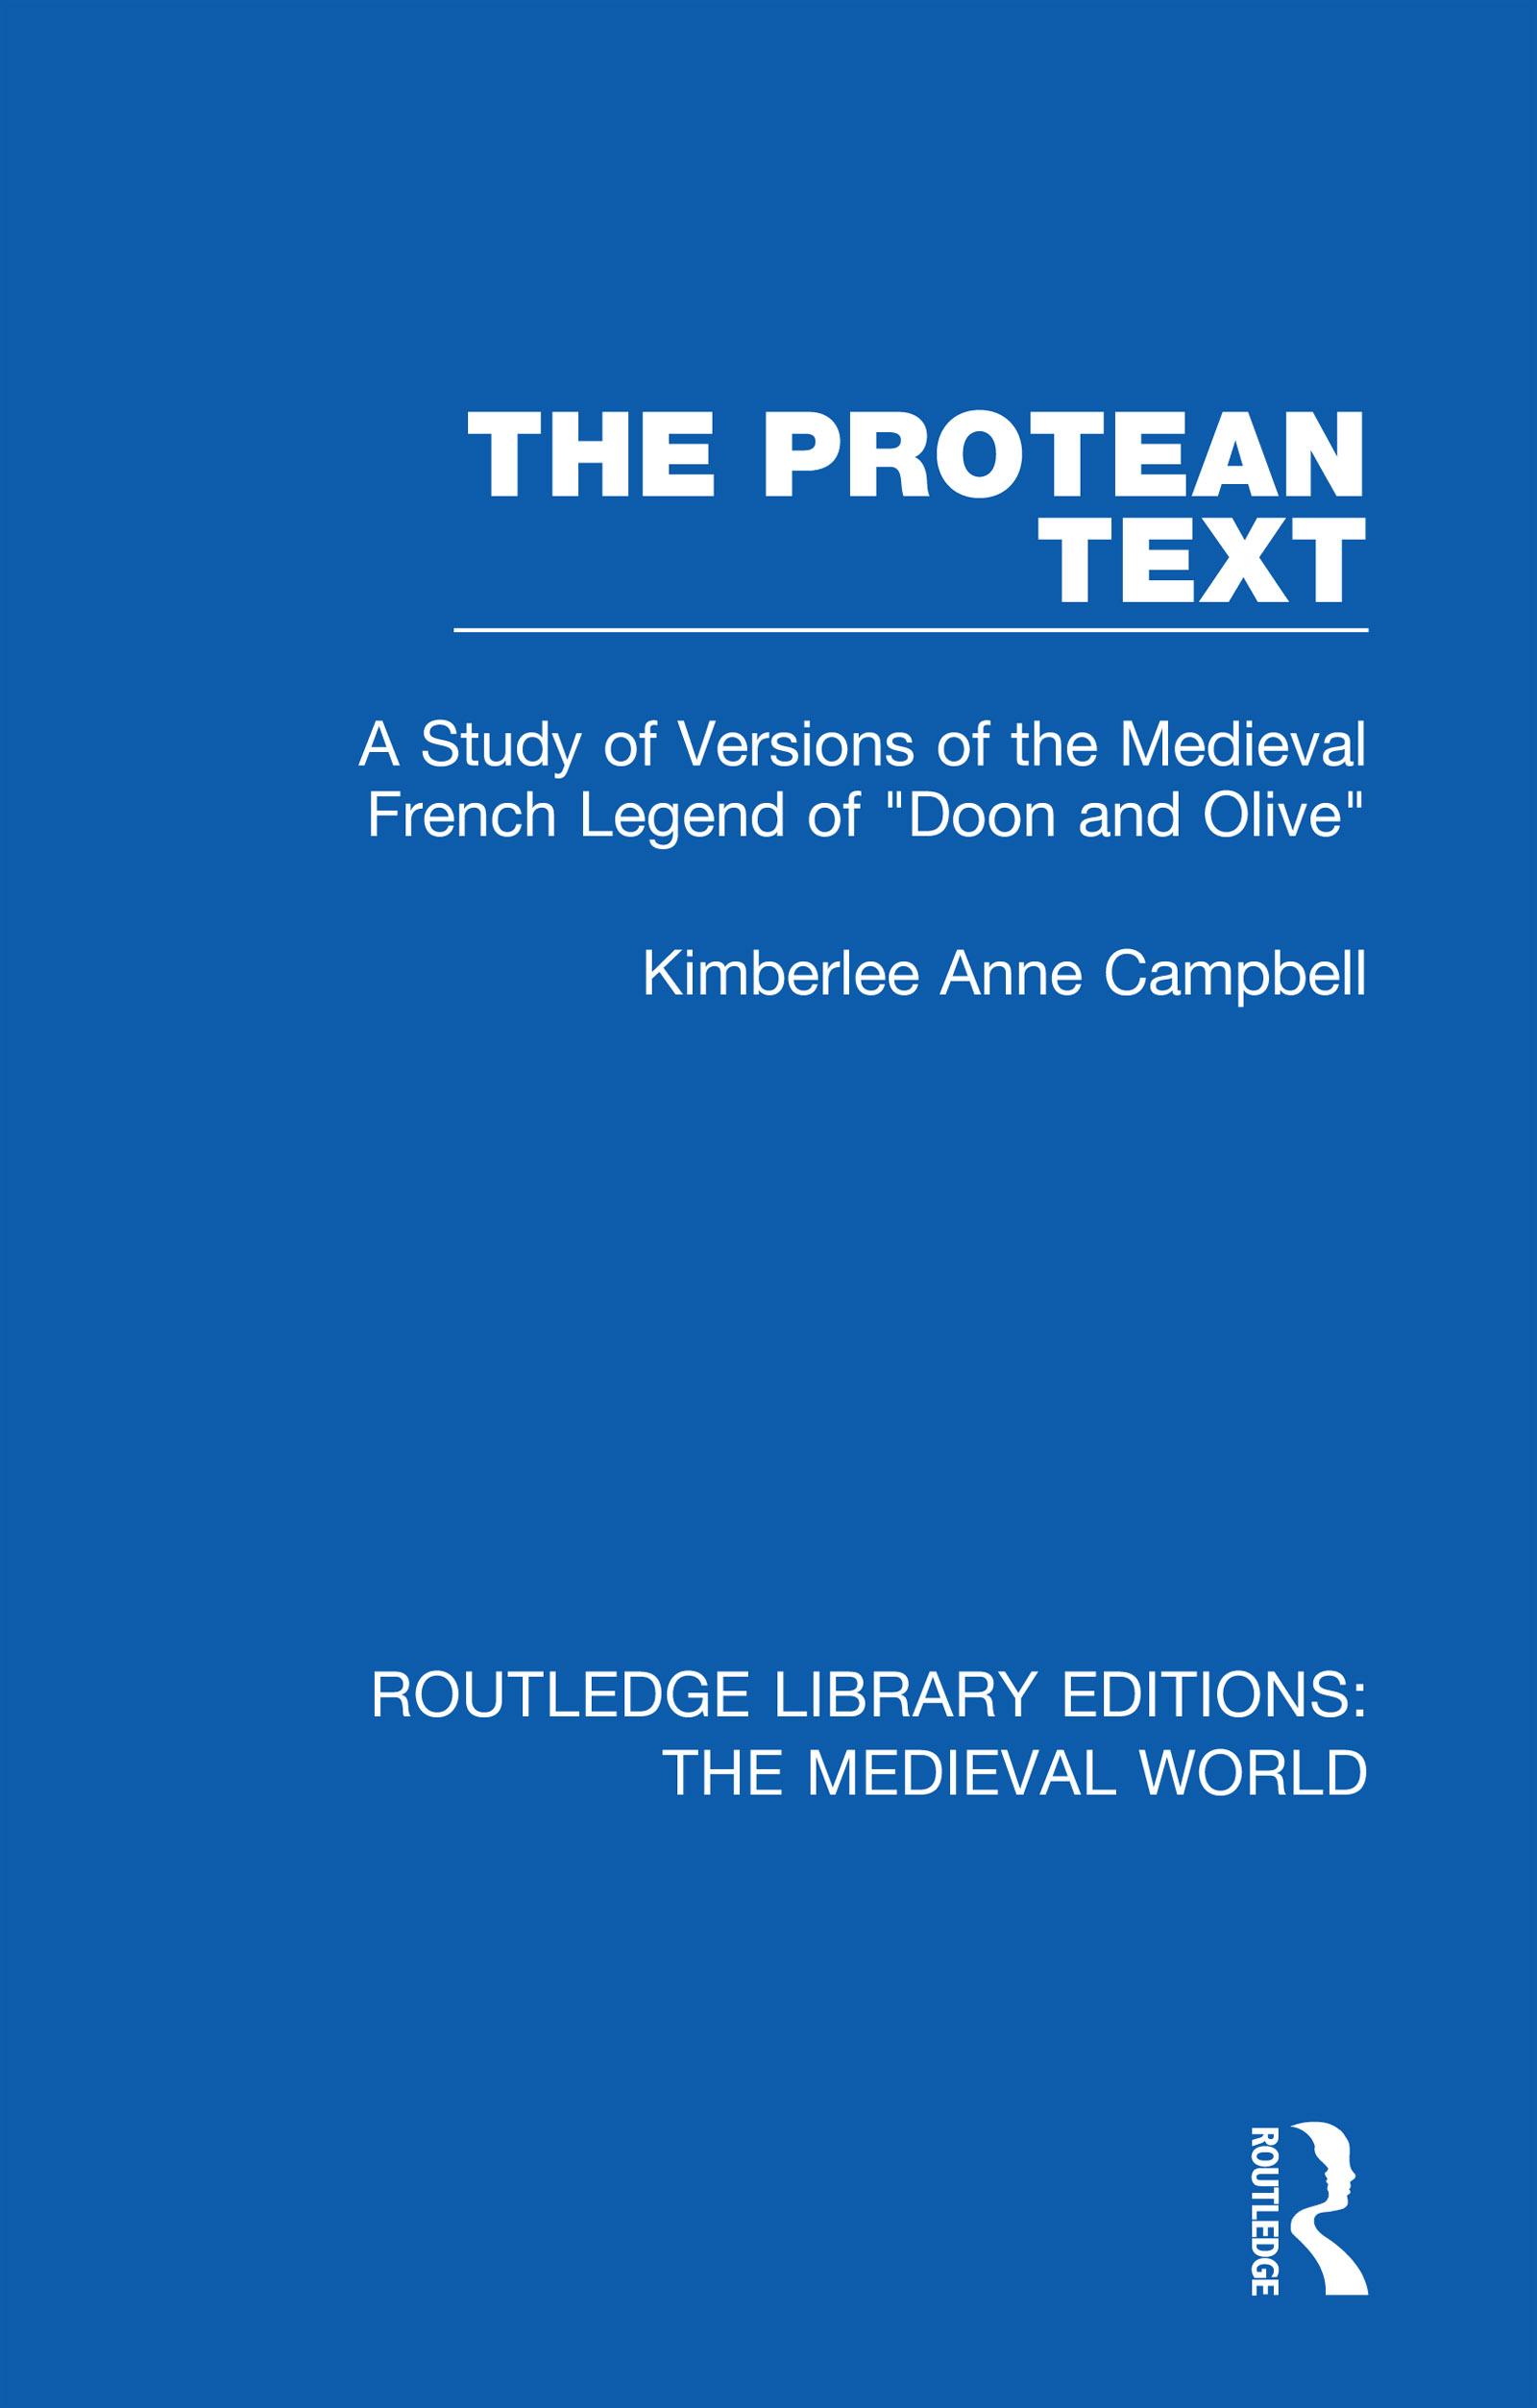 The Protean Text